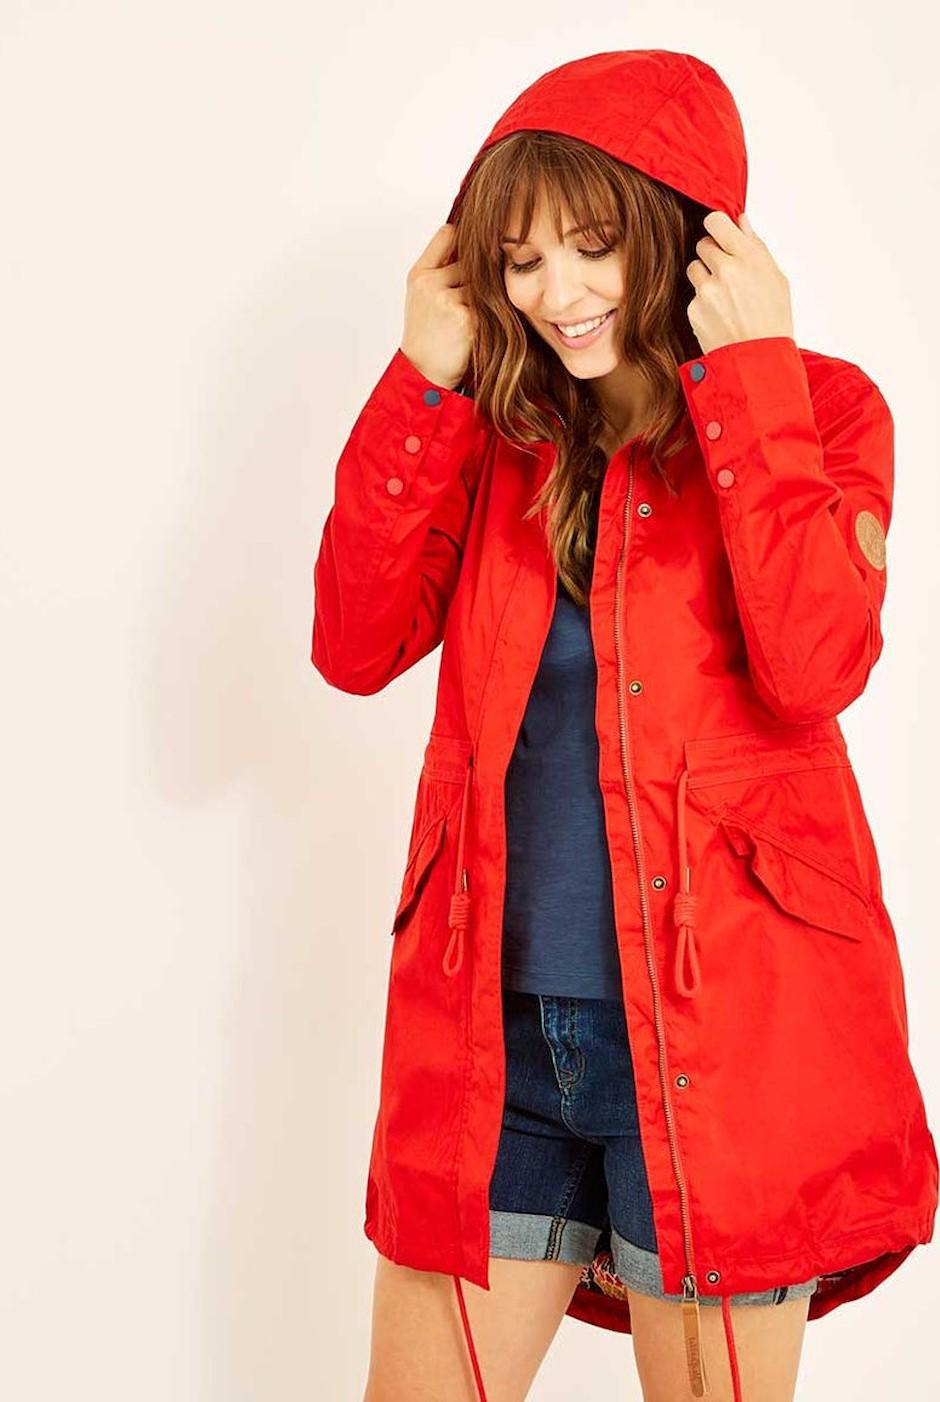 Amorite Waterproof Print Lined Parka Jacket Tango Red